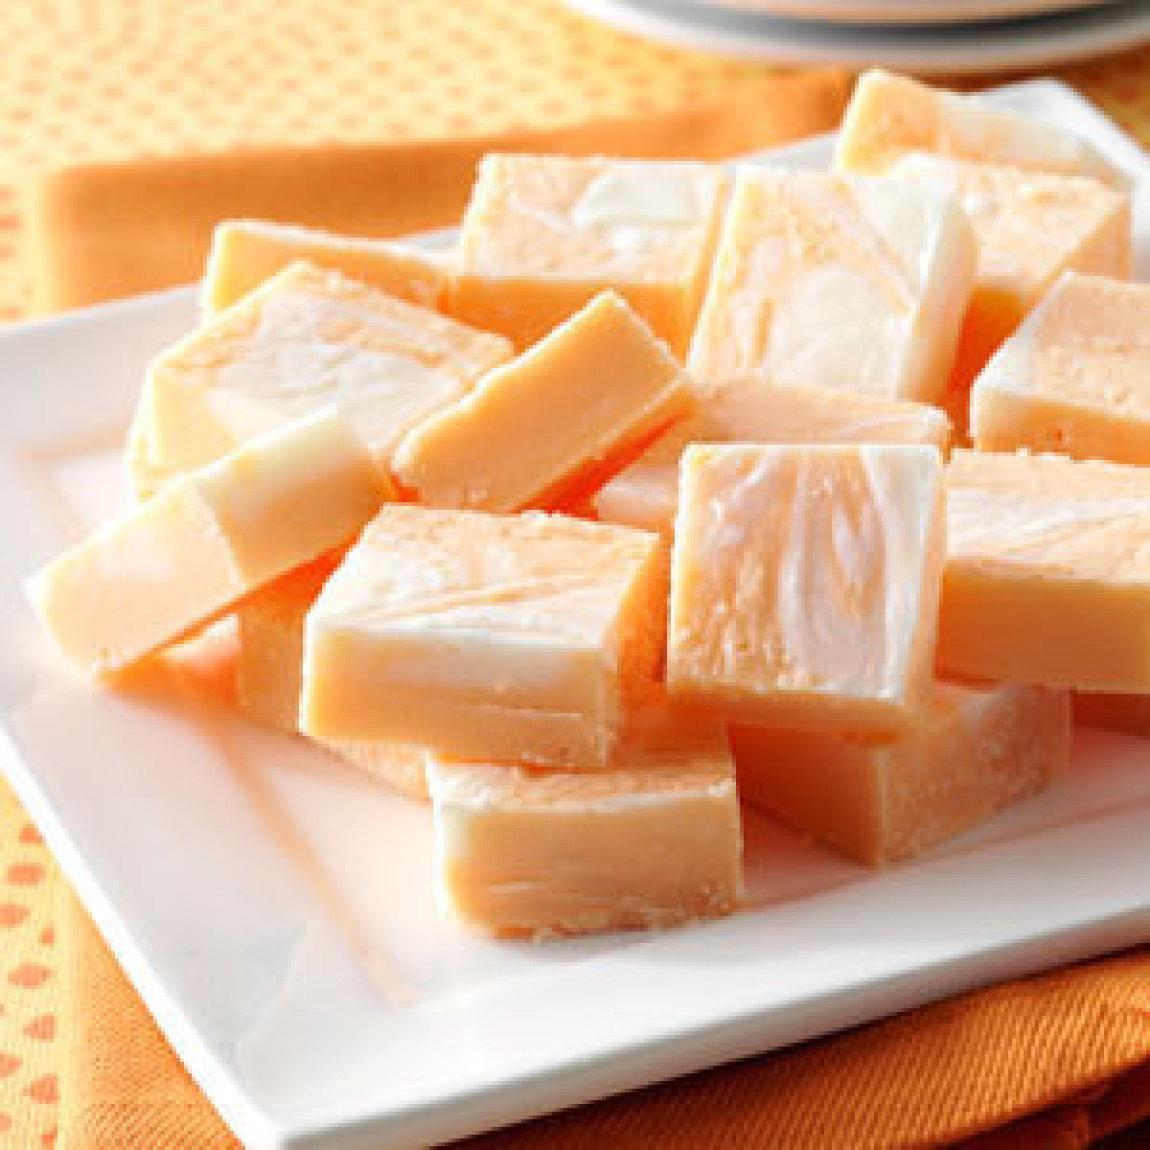 Chocolate Orange Creams Dunmore Candy Kitchen: Tiger Stripe Fudge Recipe